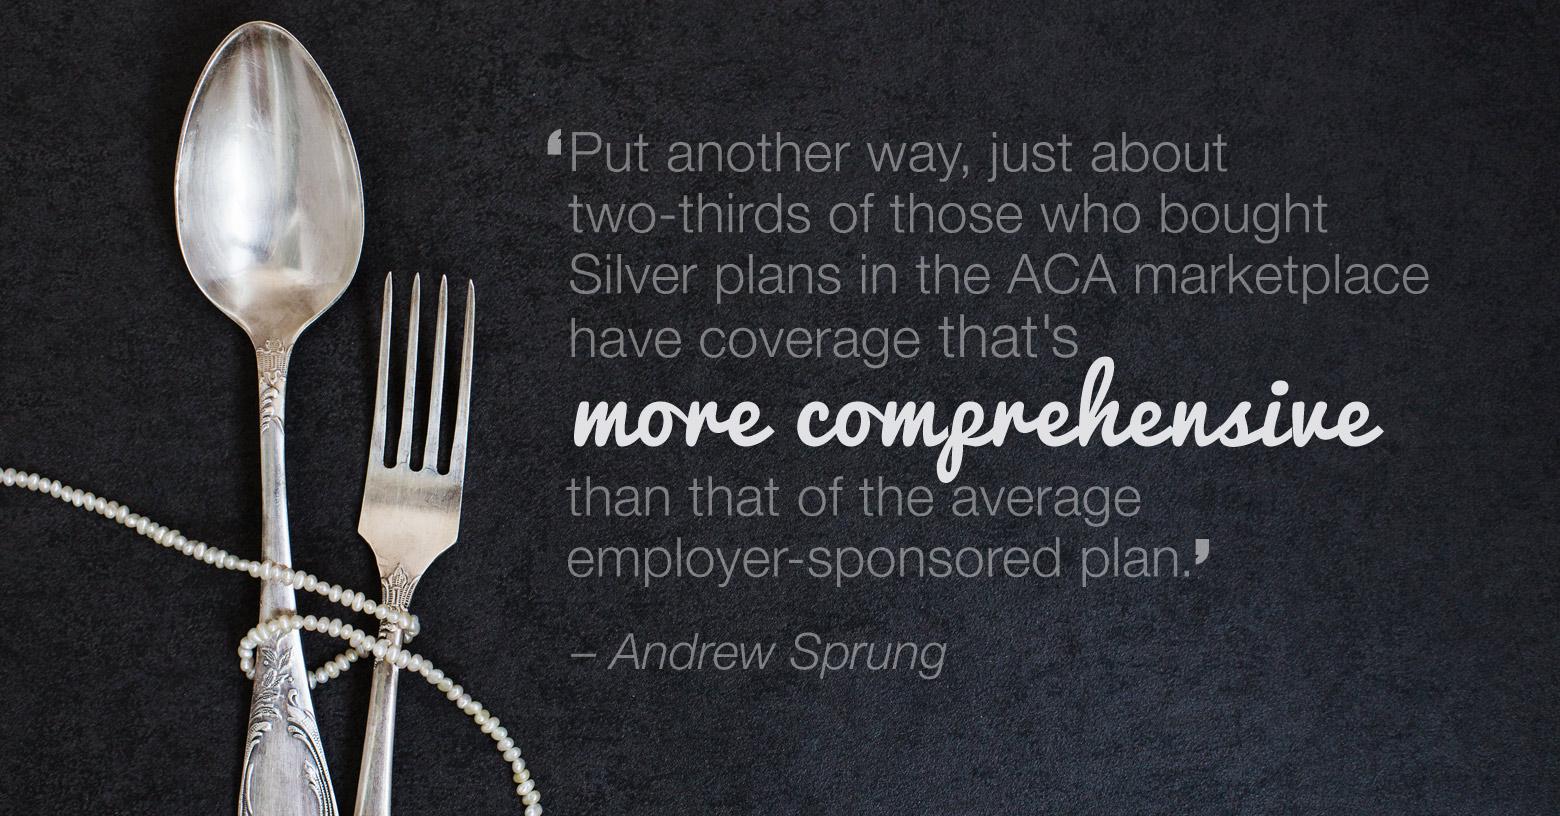 When ACA's Silver beats employer-sponsored plans photo